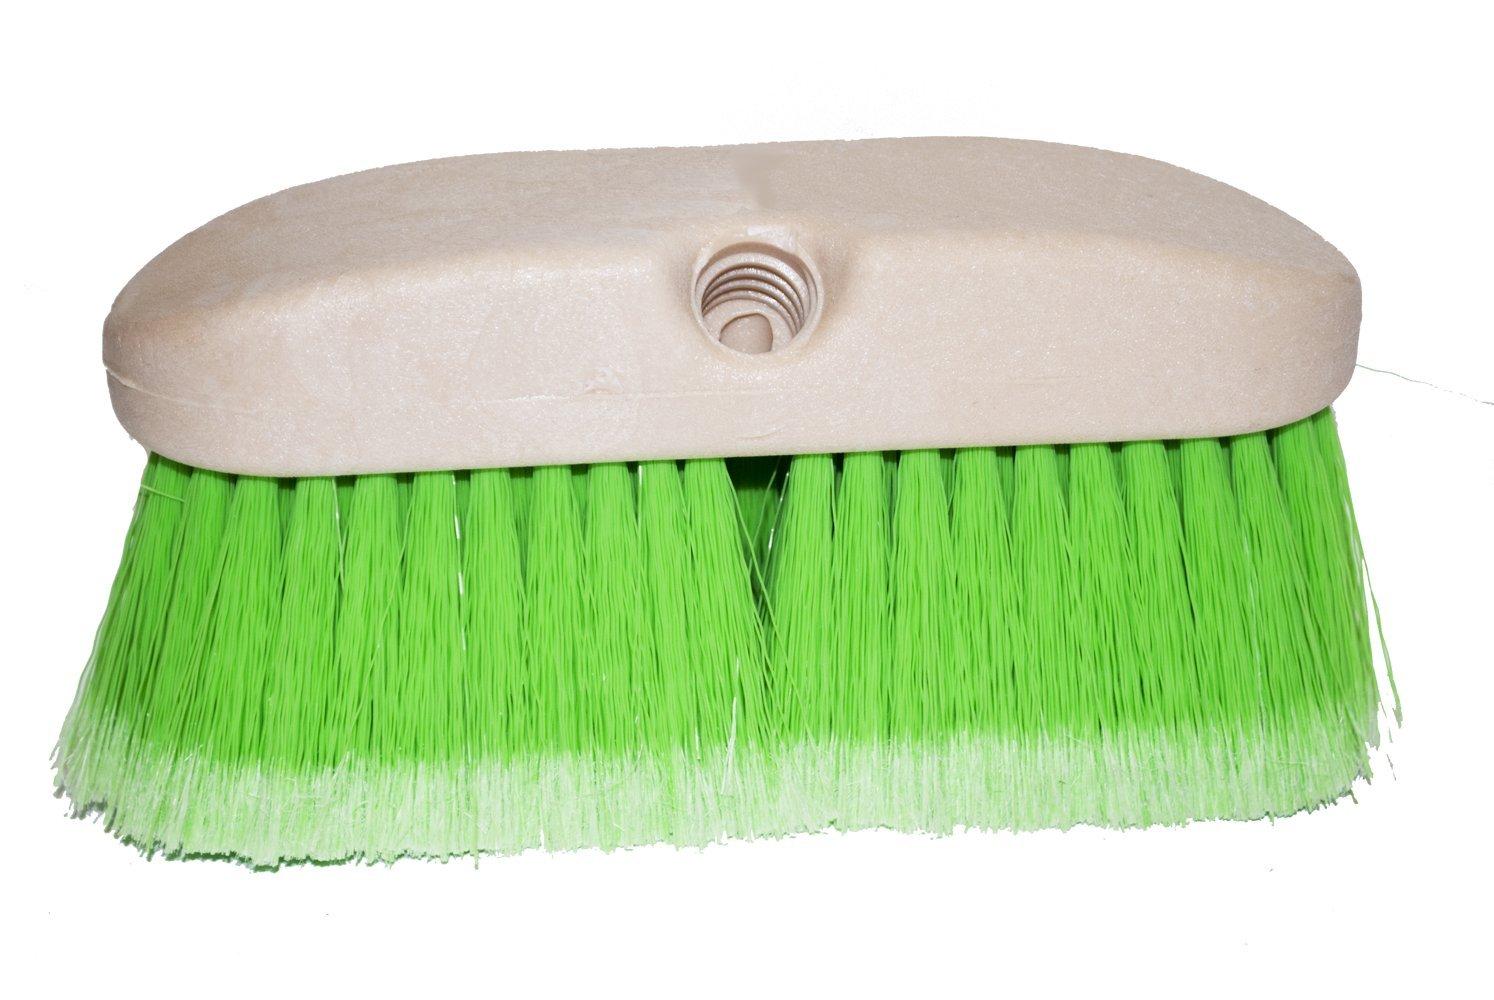 Magnolia Brush 3036-G Flagged Polystyrene Concrete Mixer and Mobile Home Washing Brush, 8'' Foam Plastic Block, 2-1/2'' Trim, Green (Case of 12)